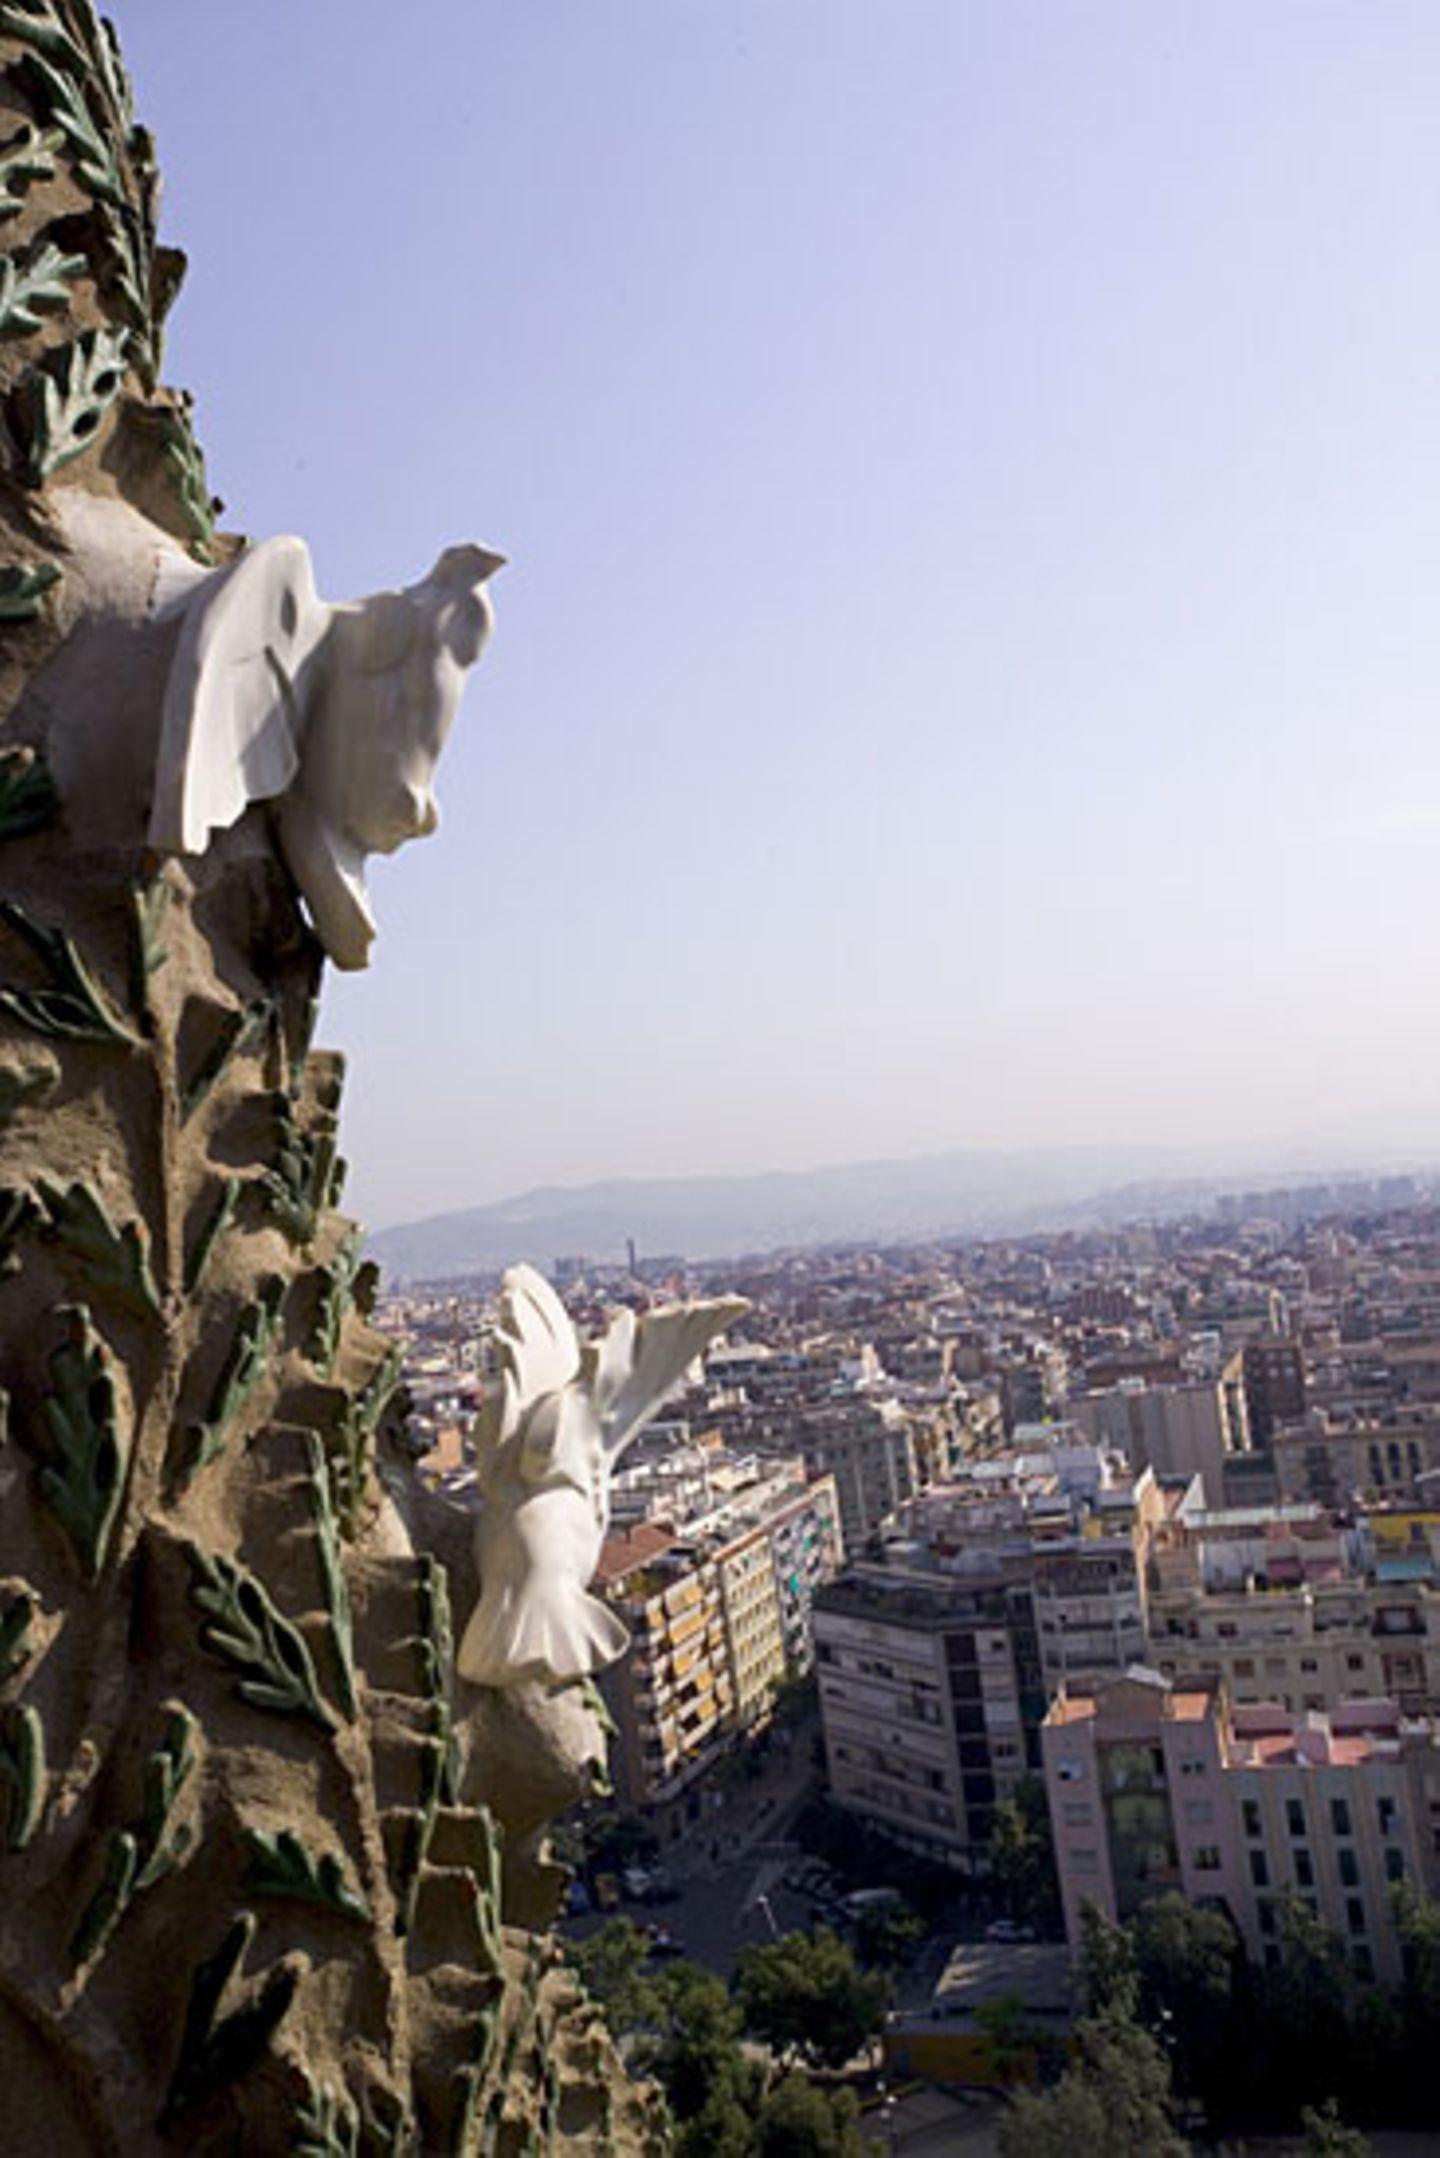 Fotogalerie: Barcelona - Bild 9